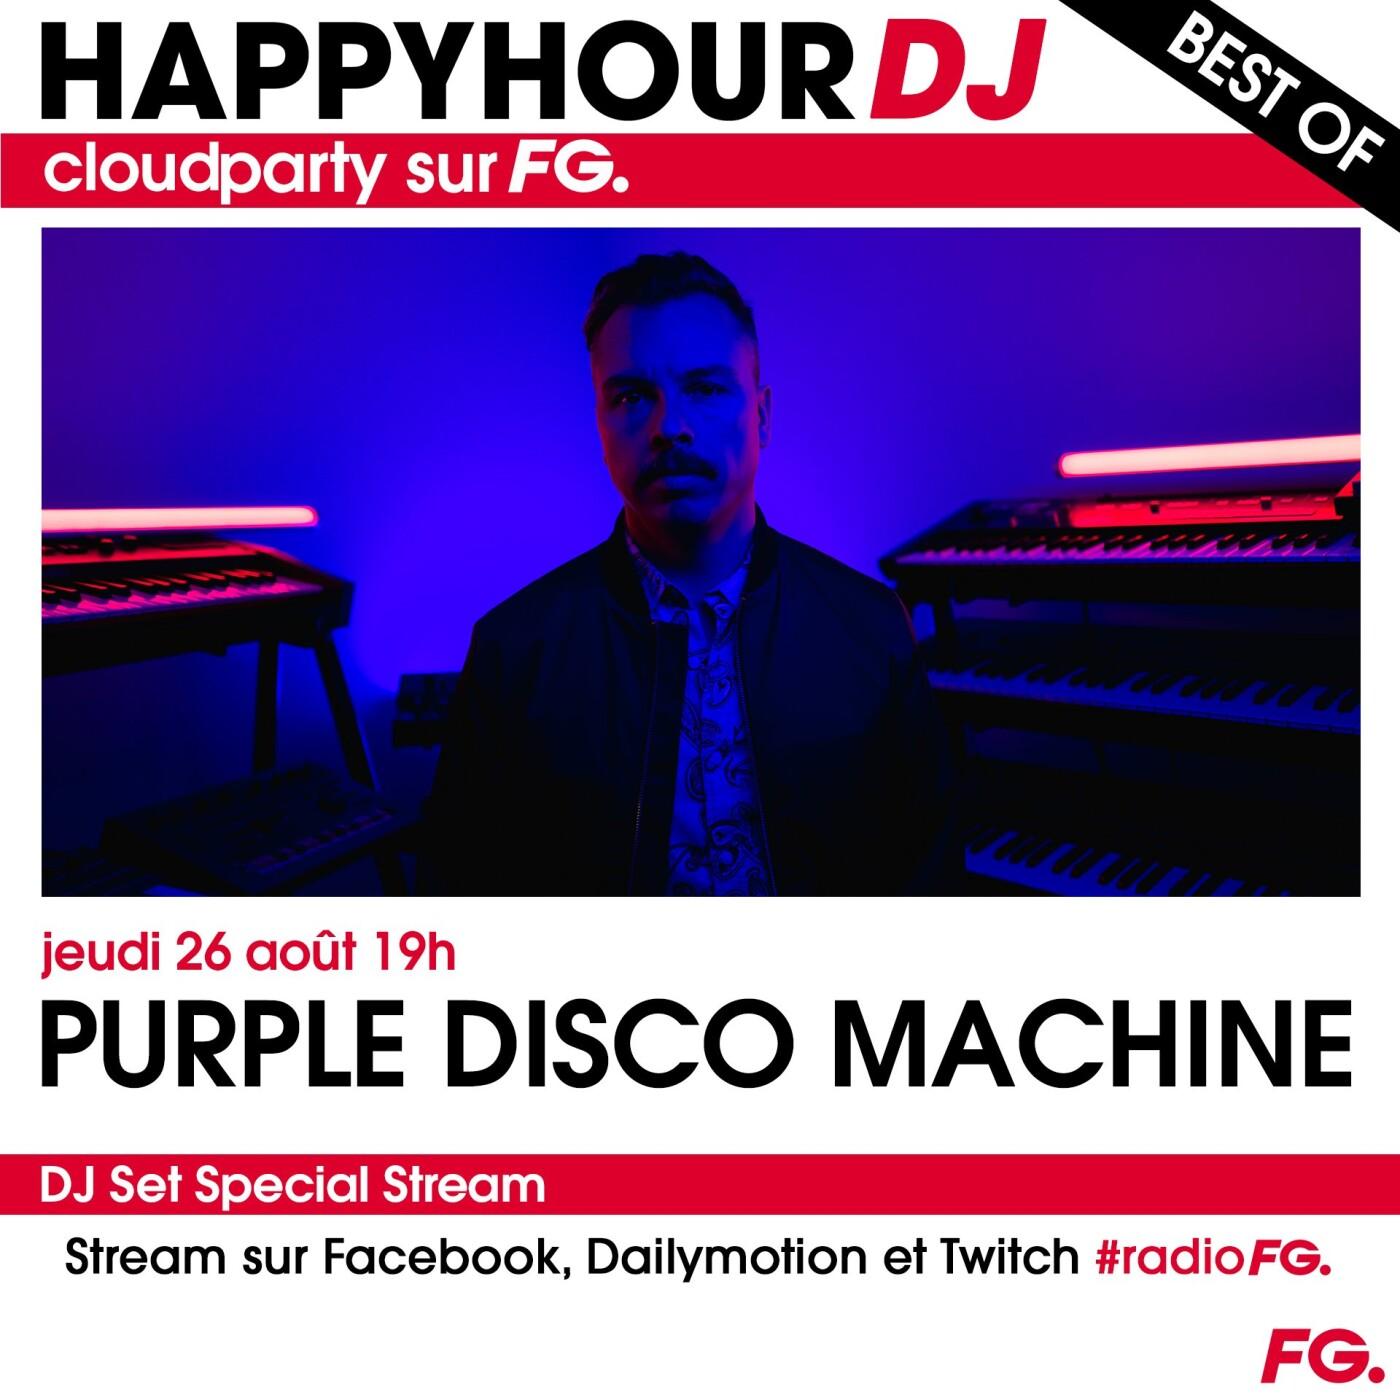 HAPPY HOUR DJ BEST OF : PURPLE DISCO MACHINE